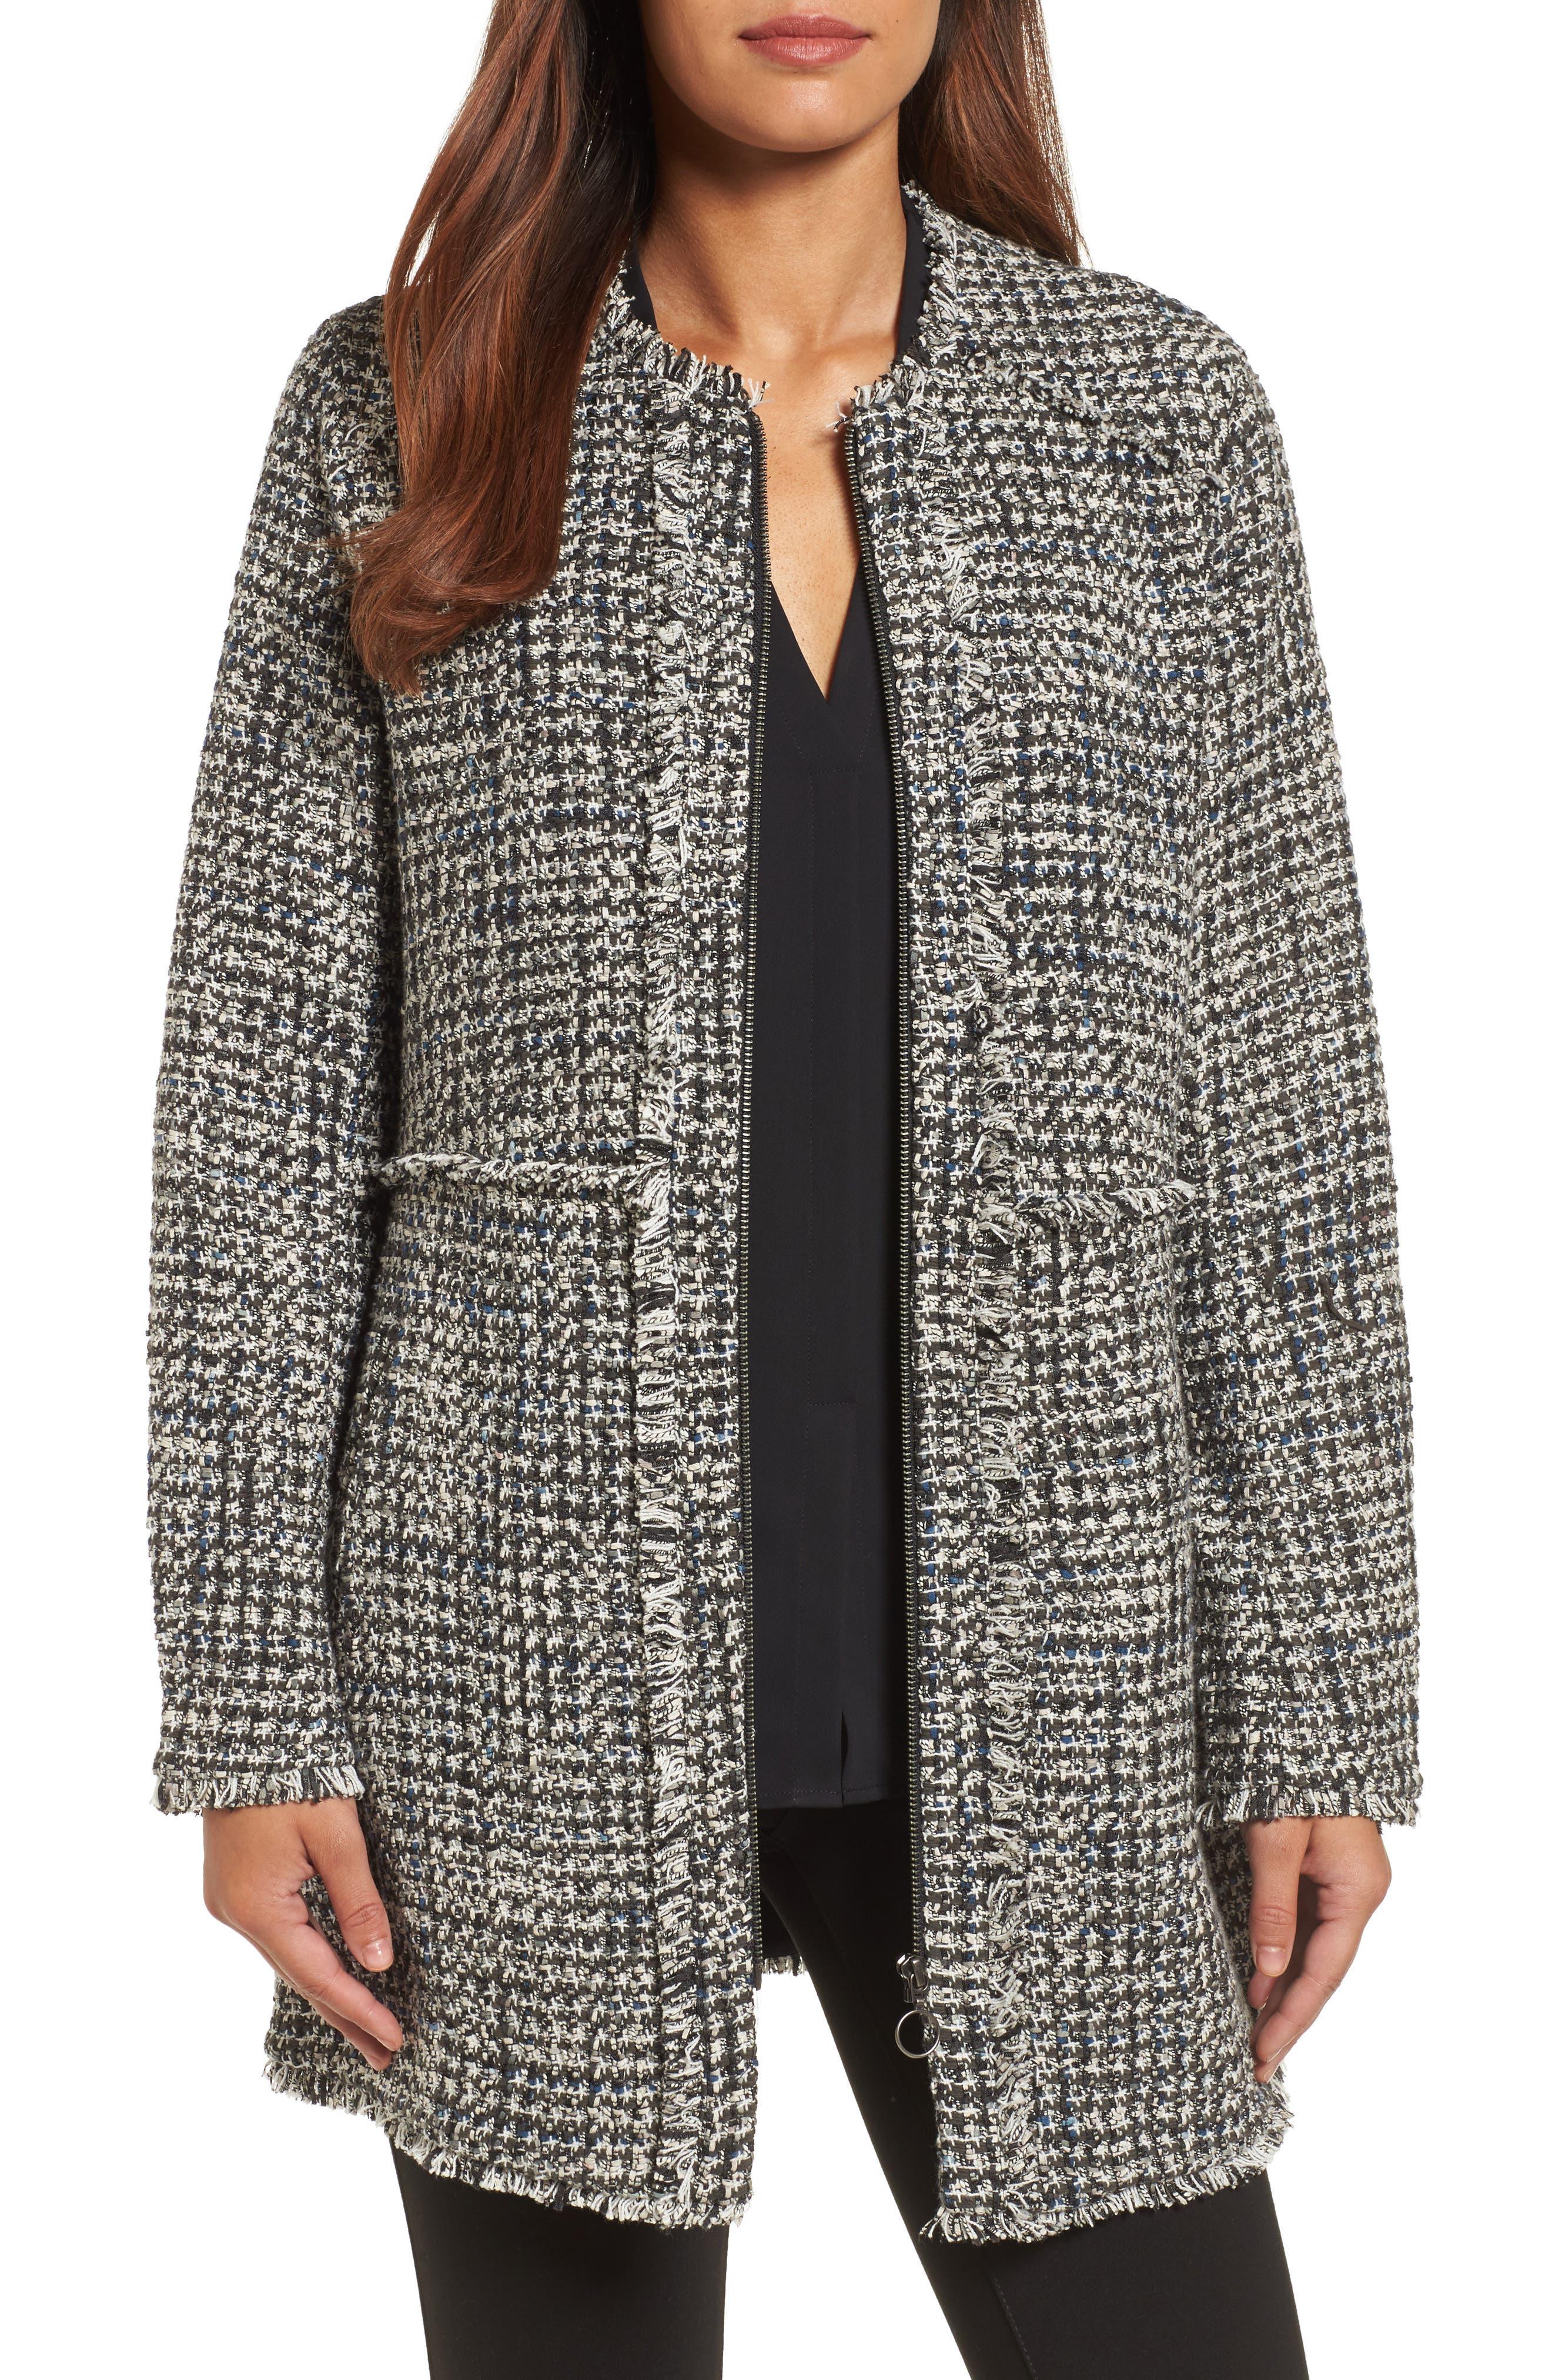 NIC + Zoe Speckled Tweed Jacket,                         Main,                         color, Multi